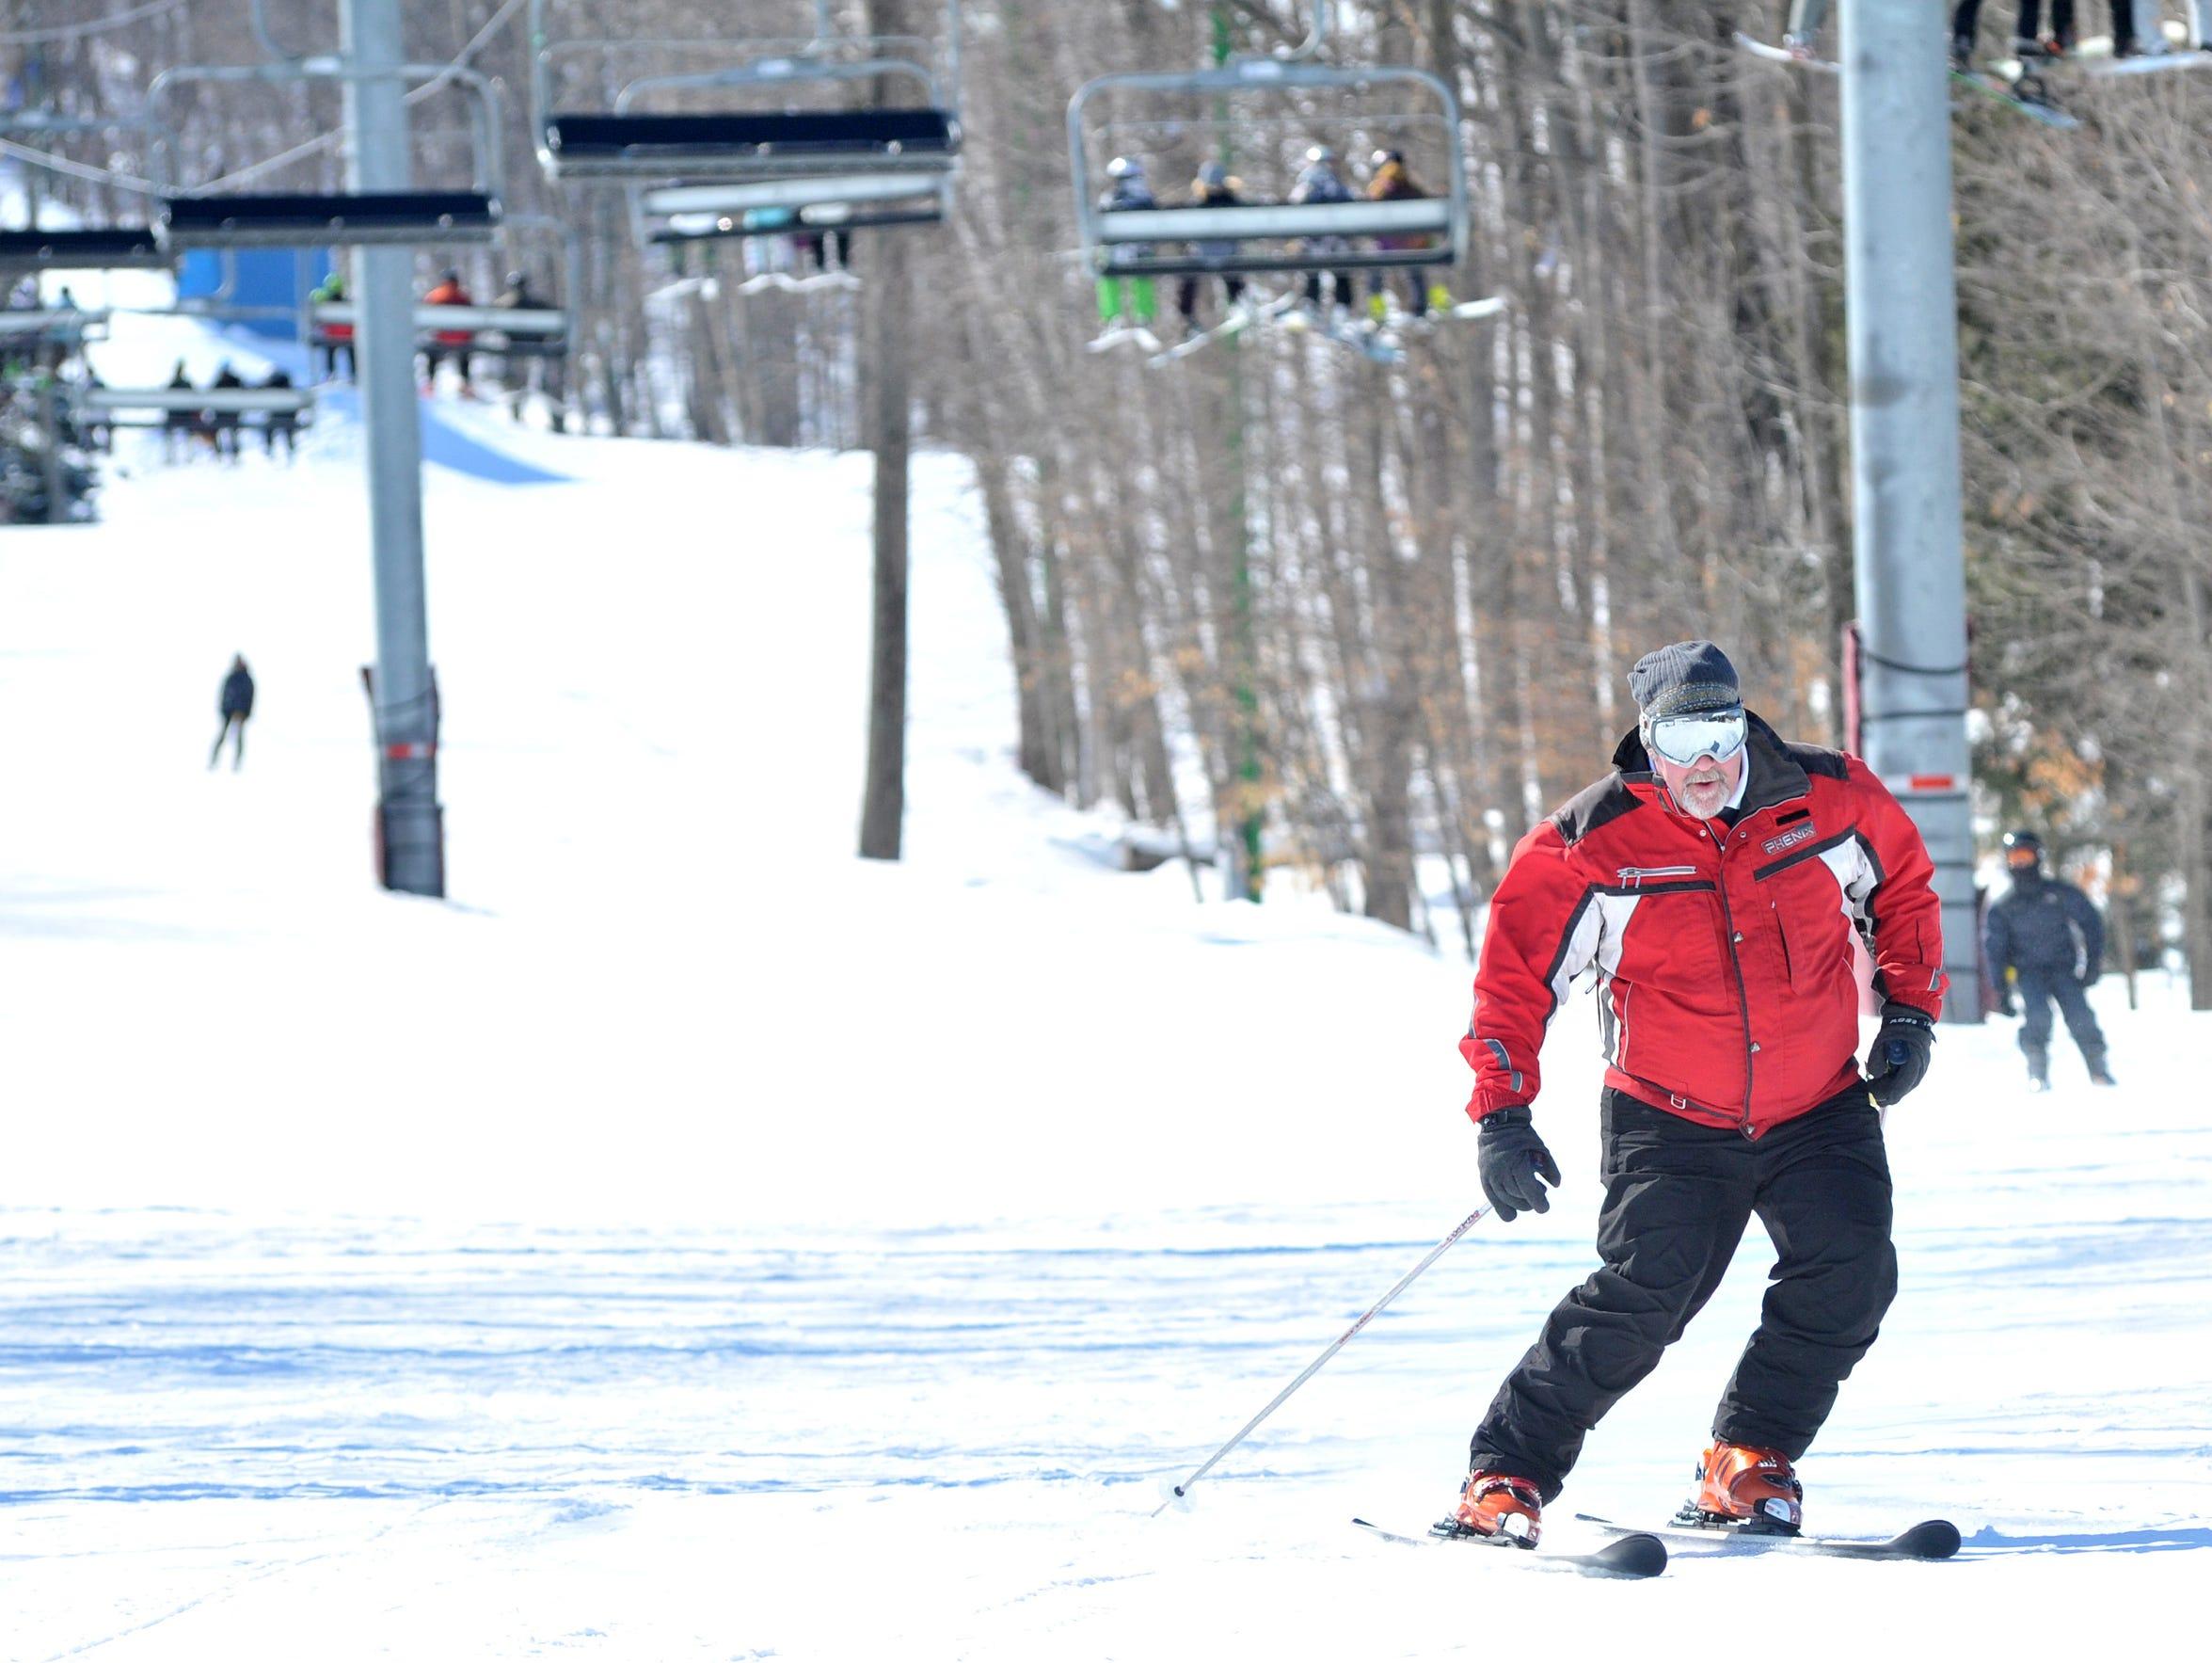 Skiers enjoy their Sunday downhill ski at the Granite